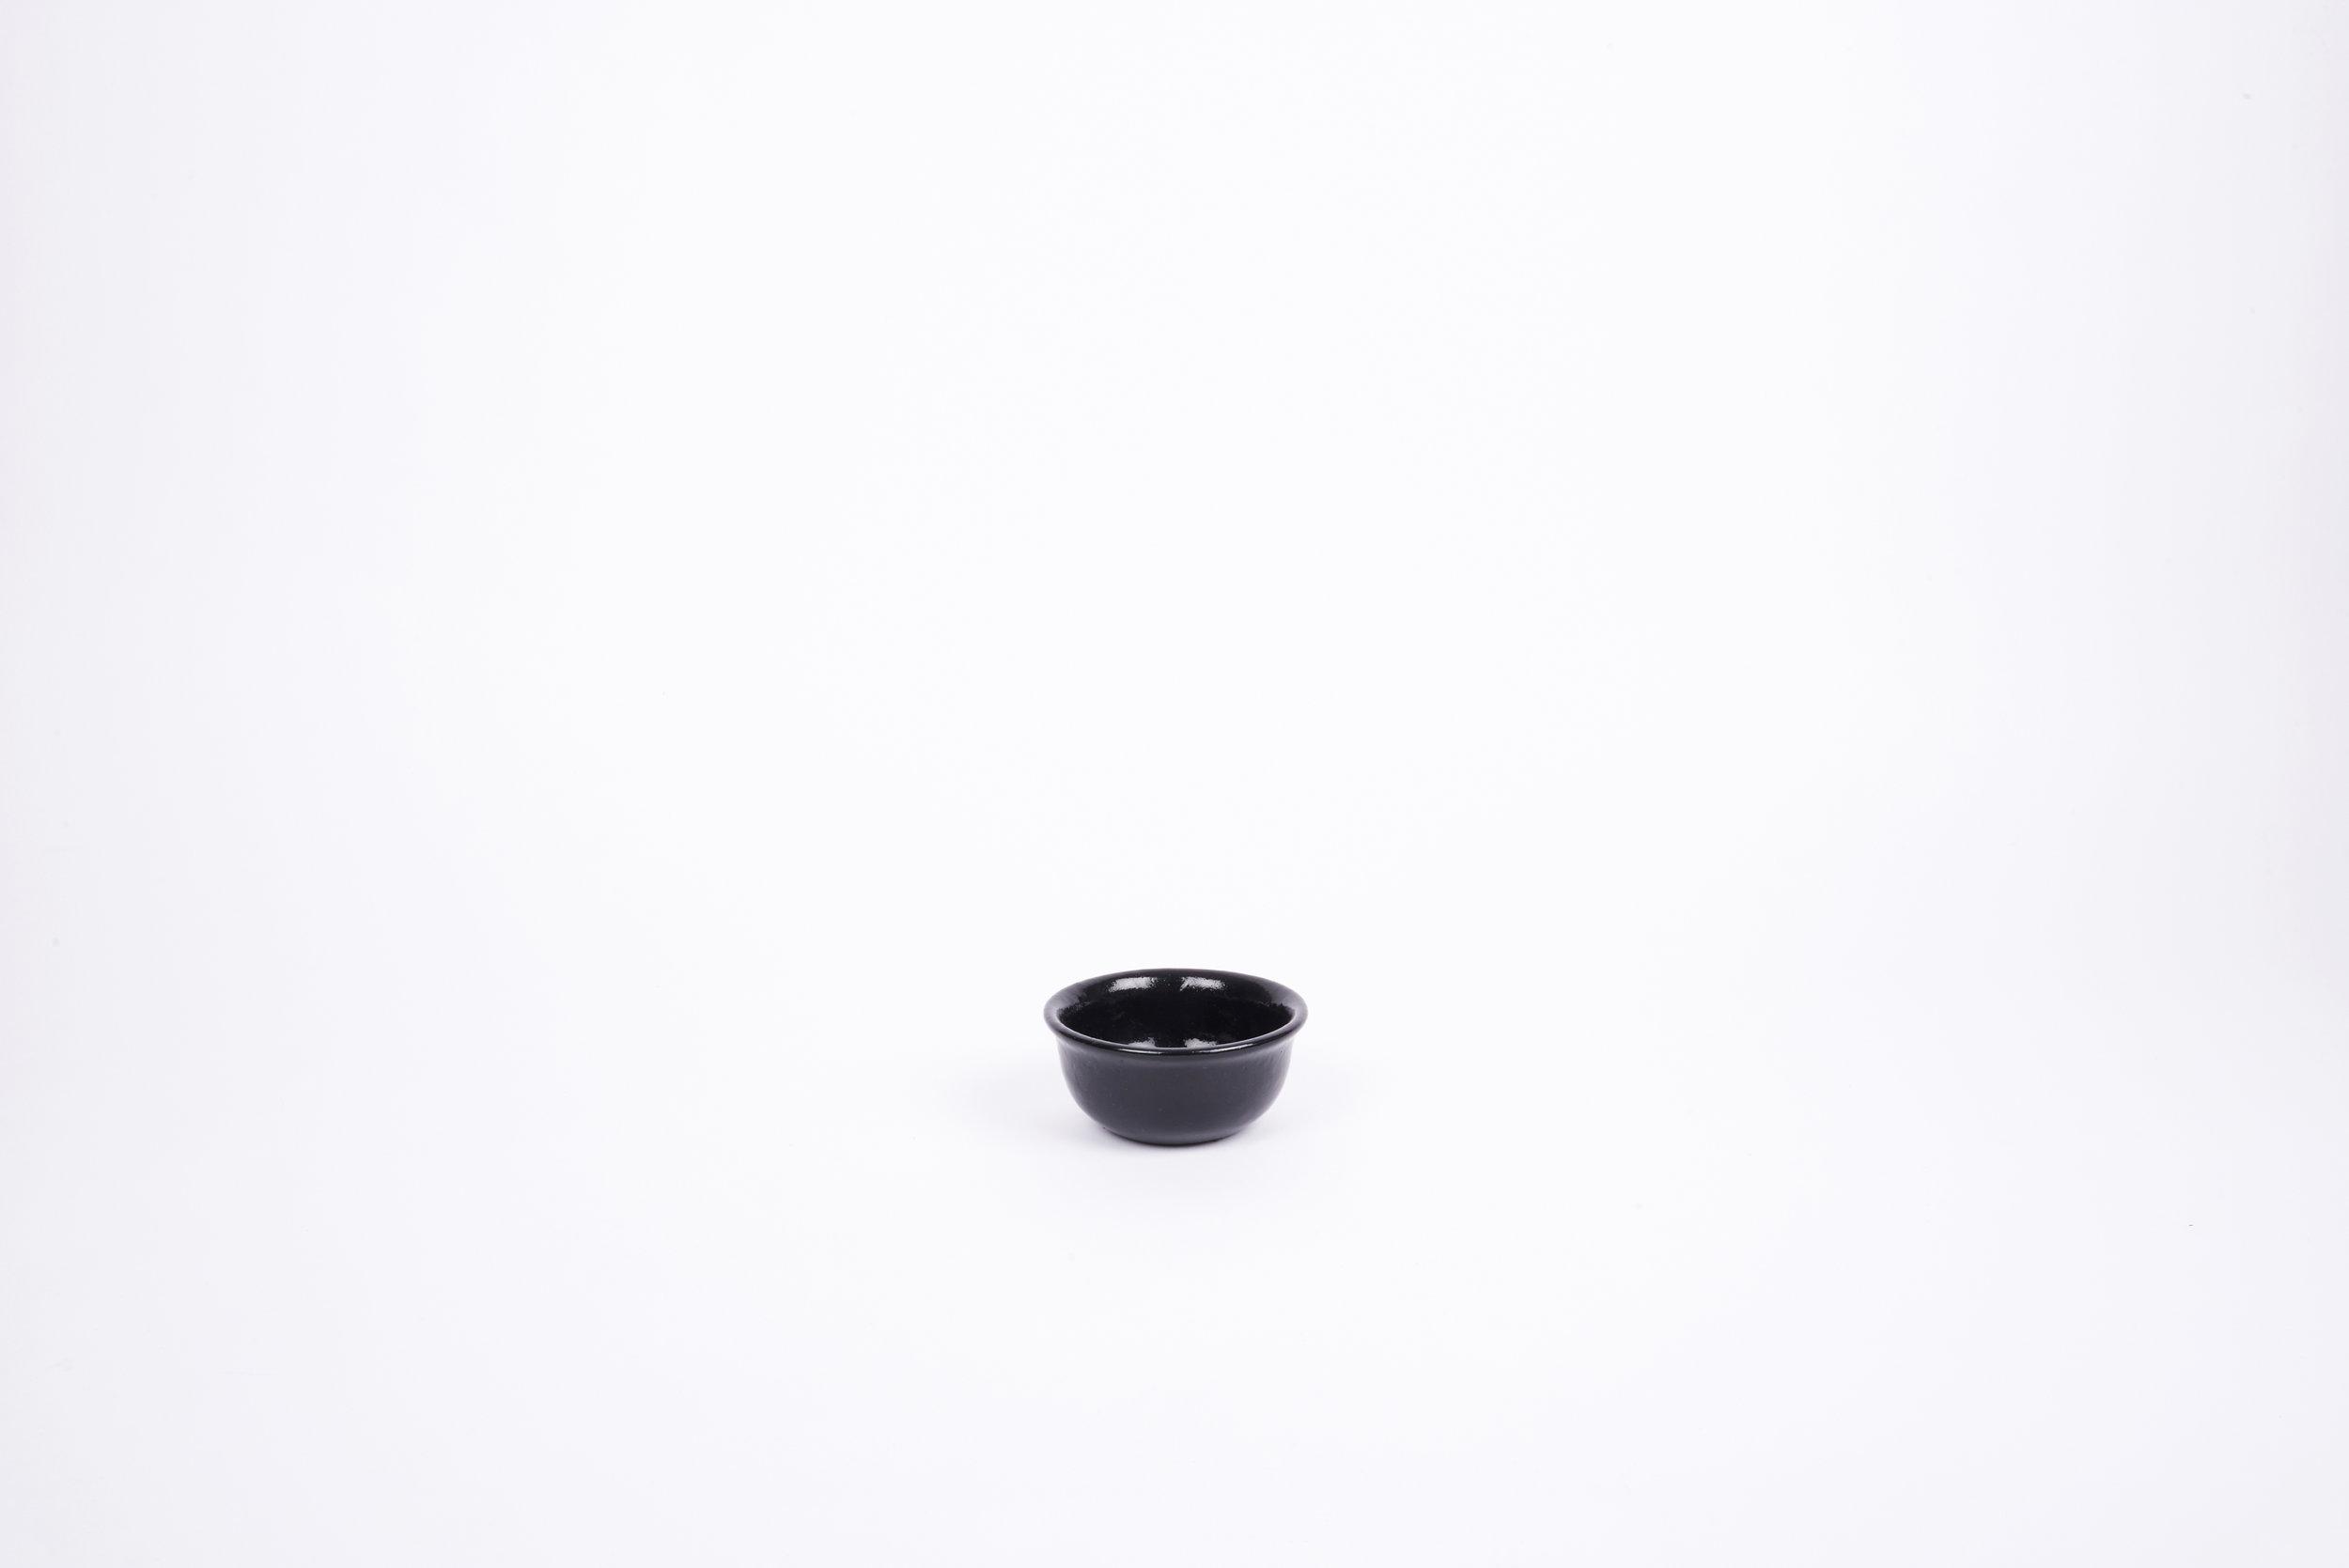 170404-pujol-individuales 11 copy.jpg